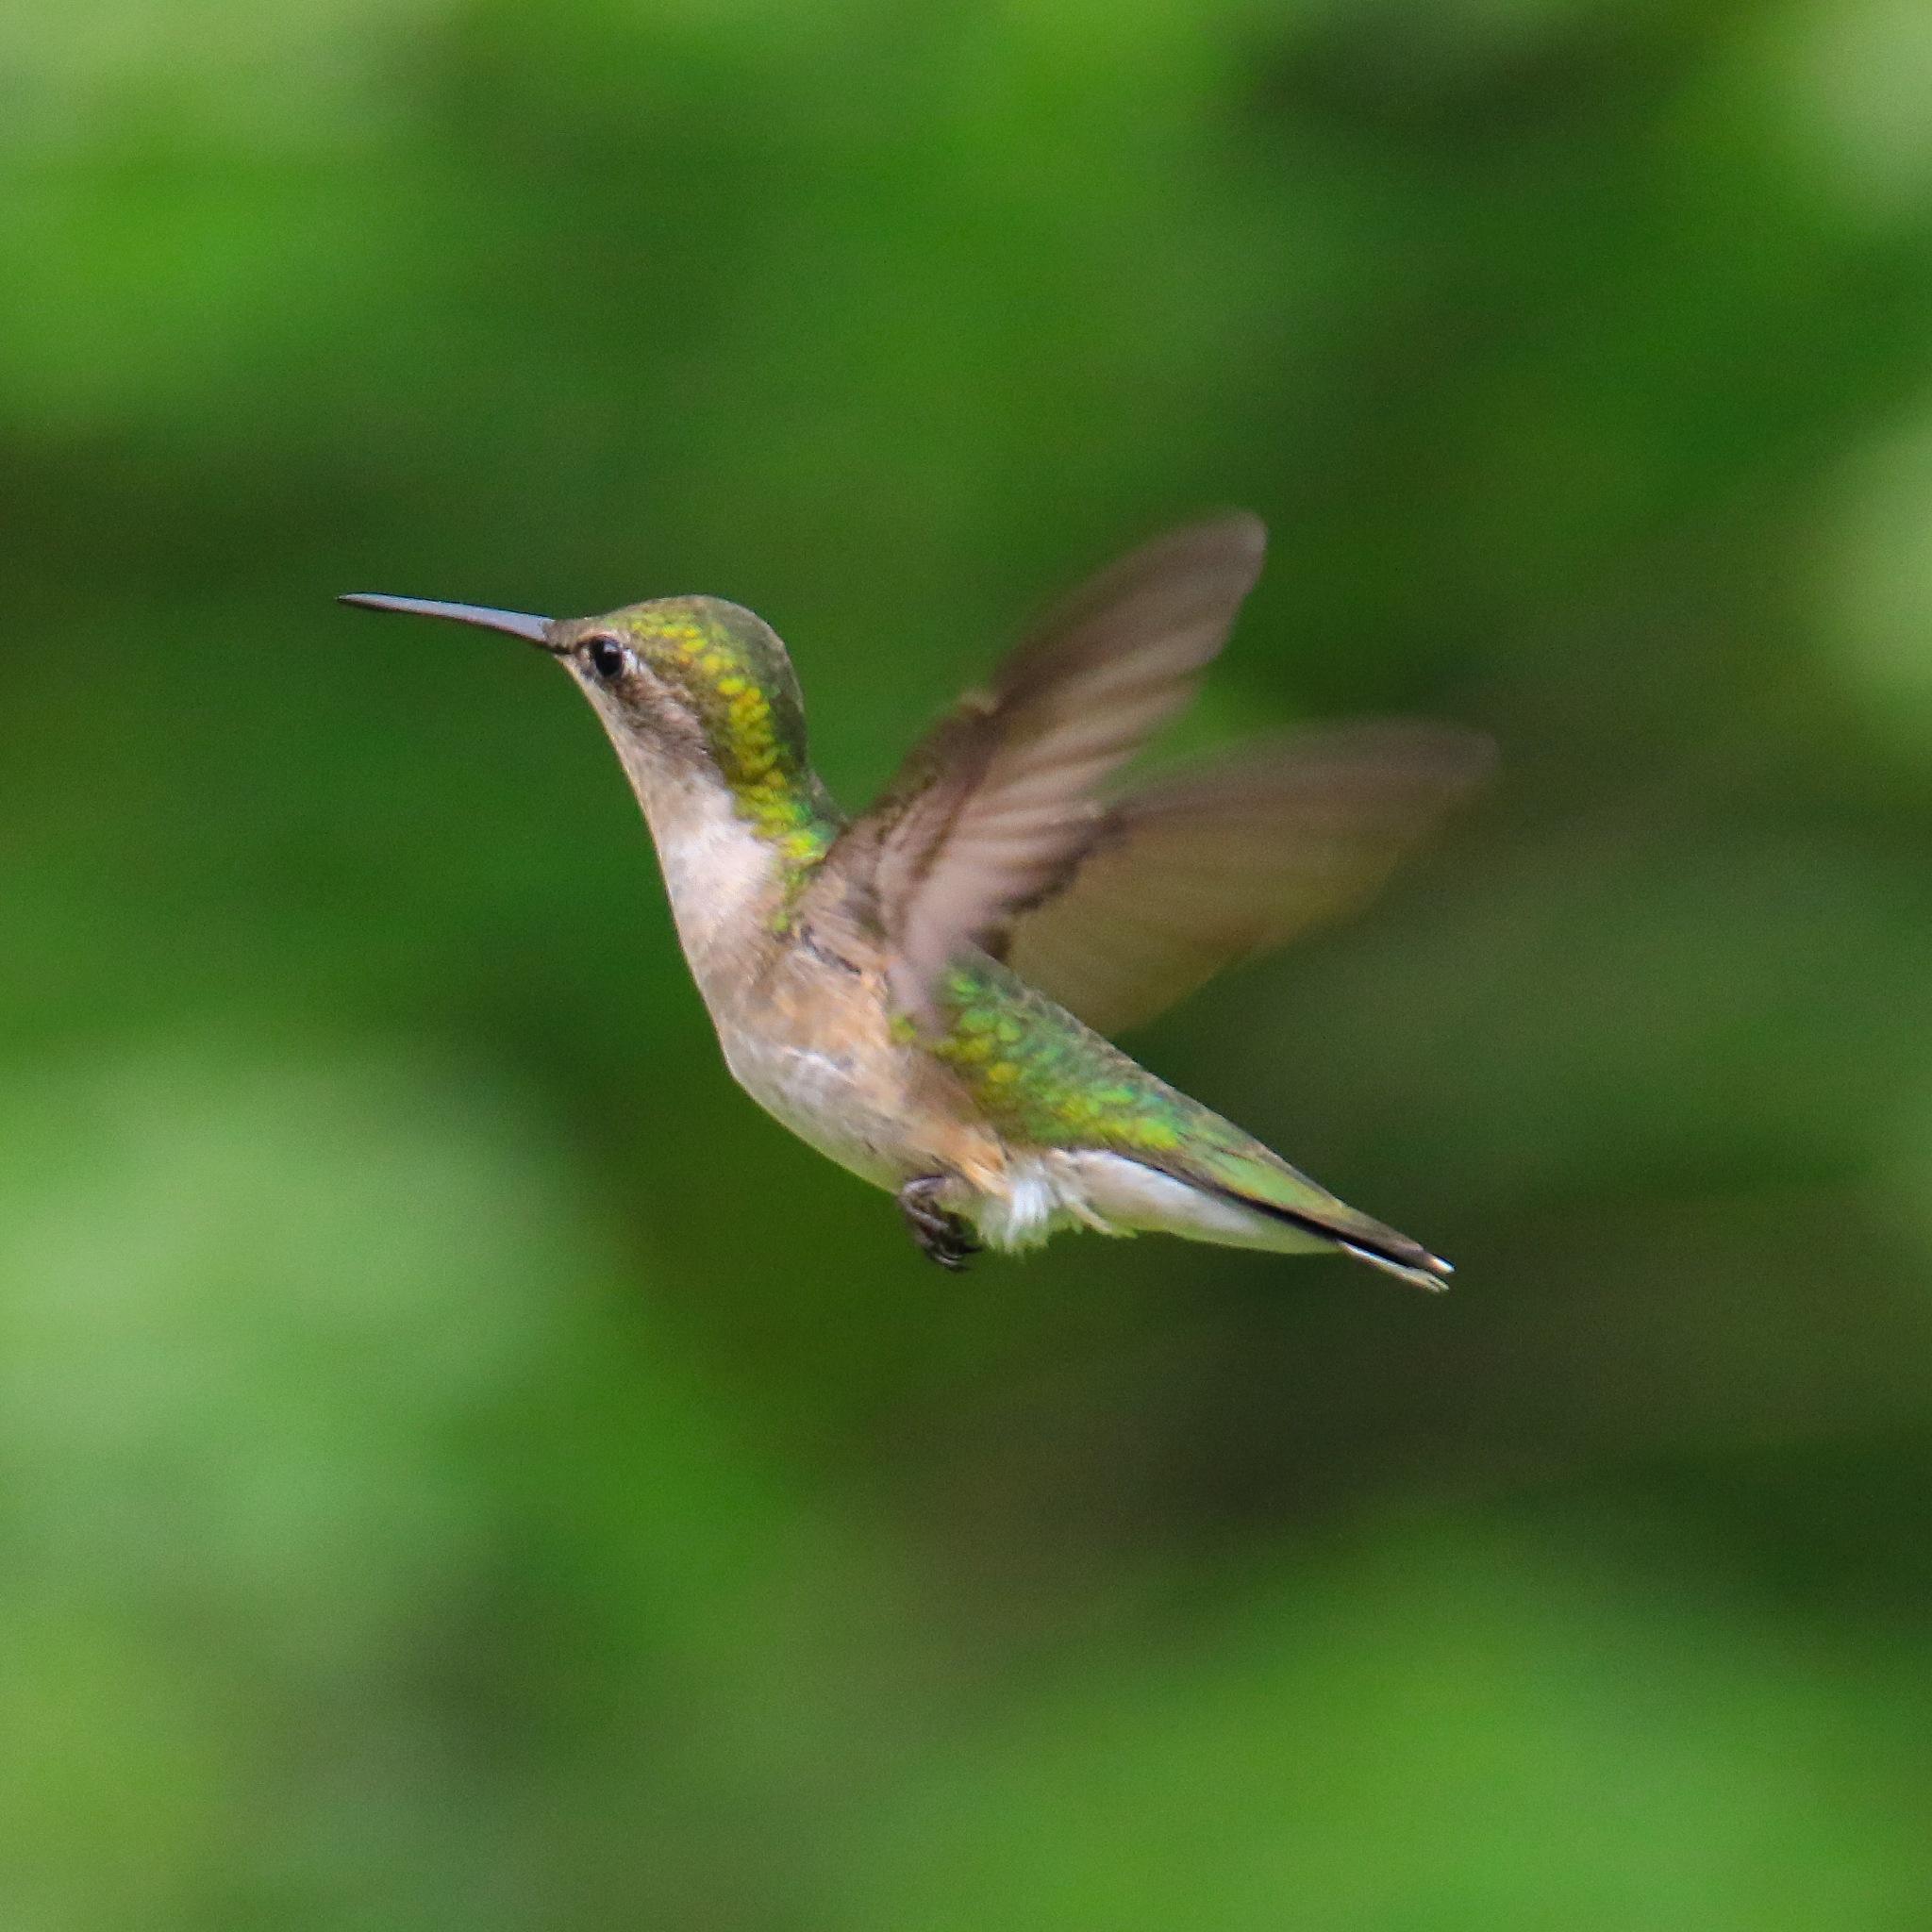 Humming Bird 2 by Tim Stevens